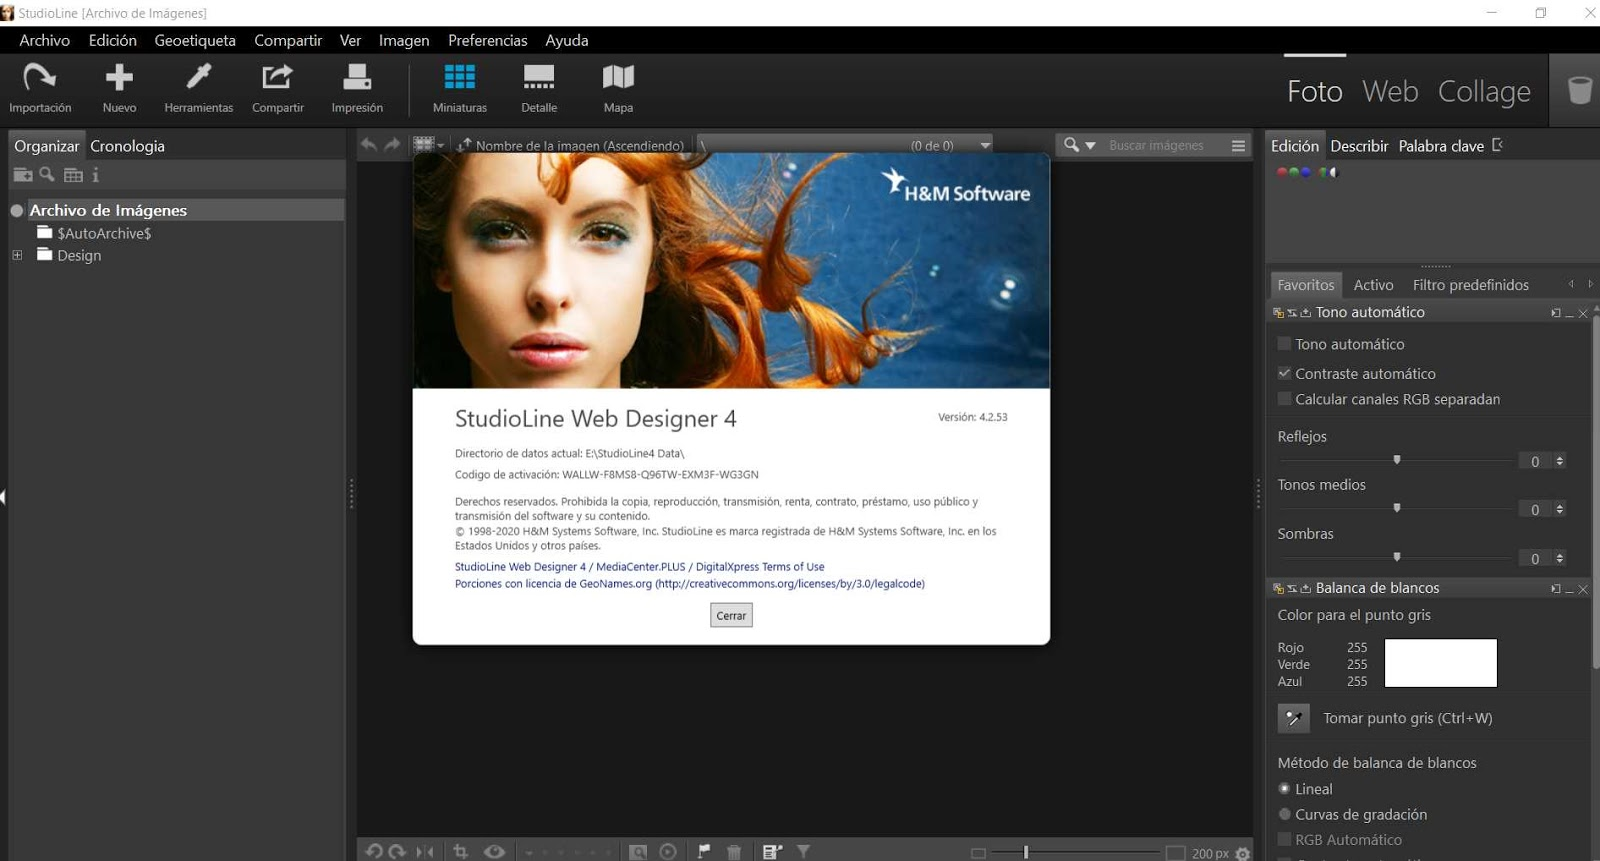 StudioLine Web Designer 4.2.53 poster box cover